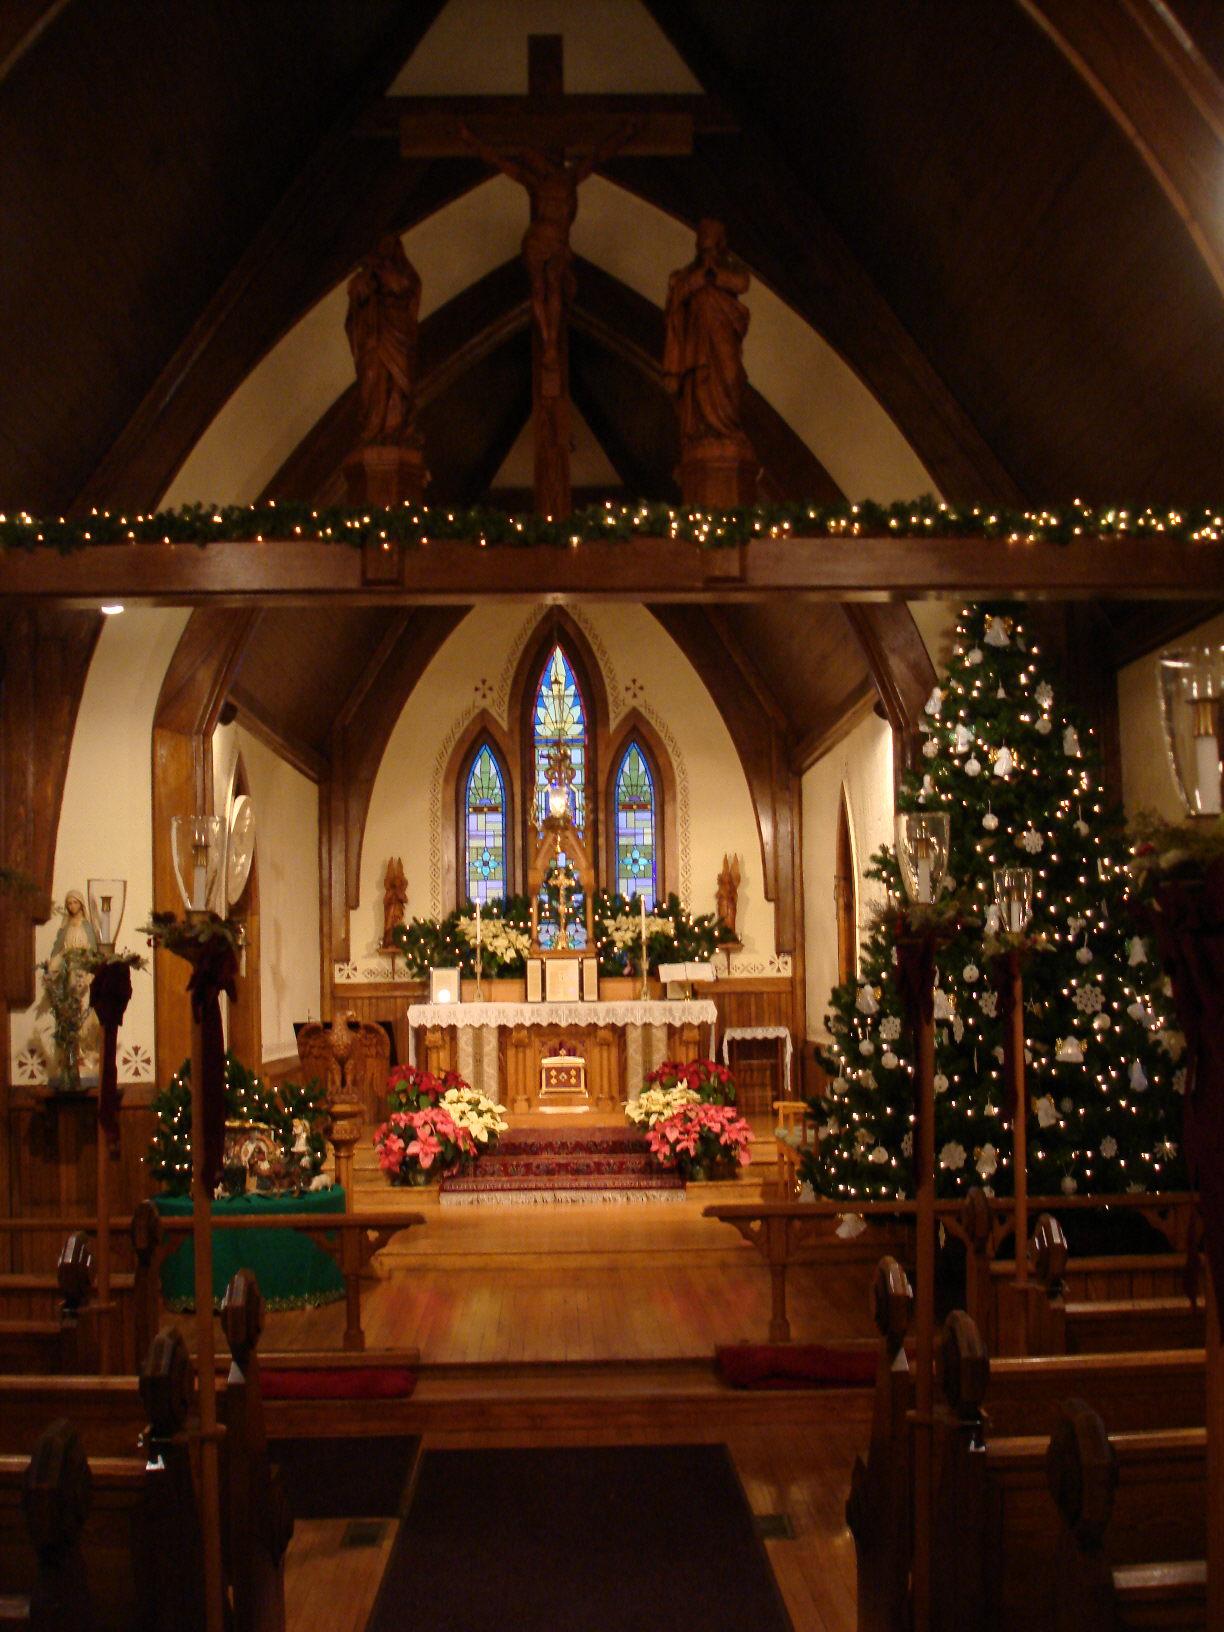 File:St Agnes Church, Algoma WI, interior at Christmas.jpg